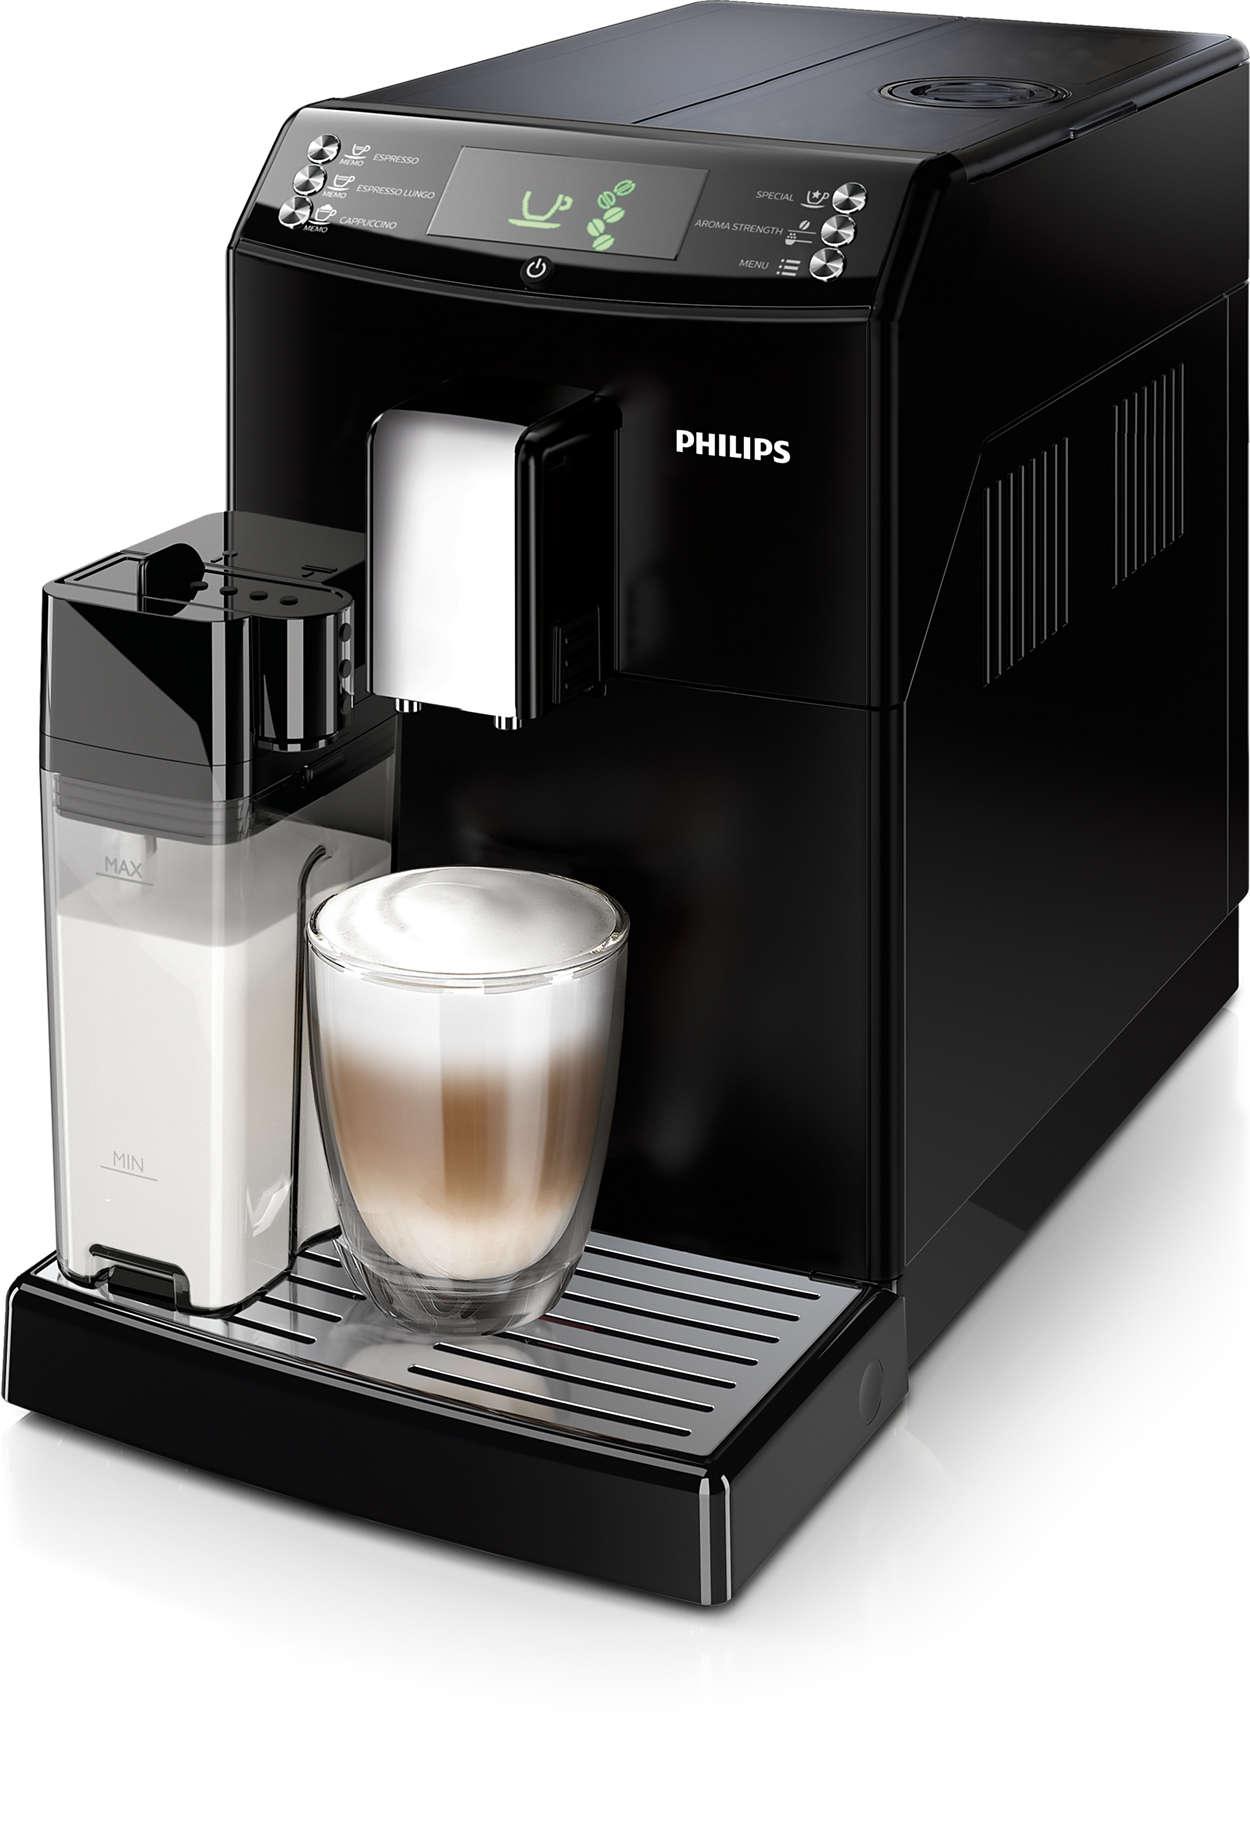 3100 series kaffeevollautomat hd8834 01 philips. Black Bedroom Furniture Sets. Home Design Ideas